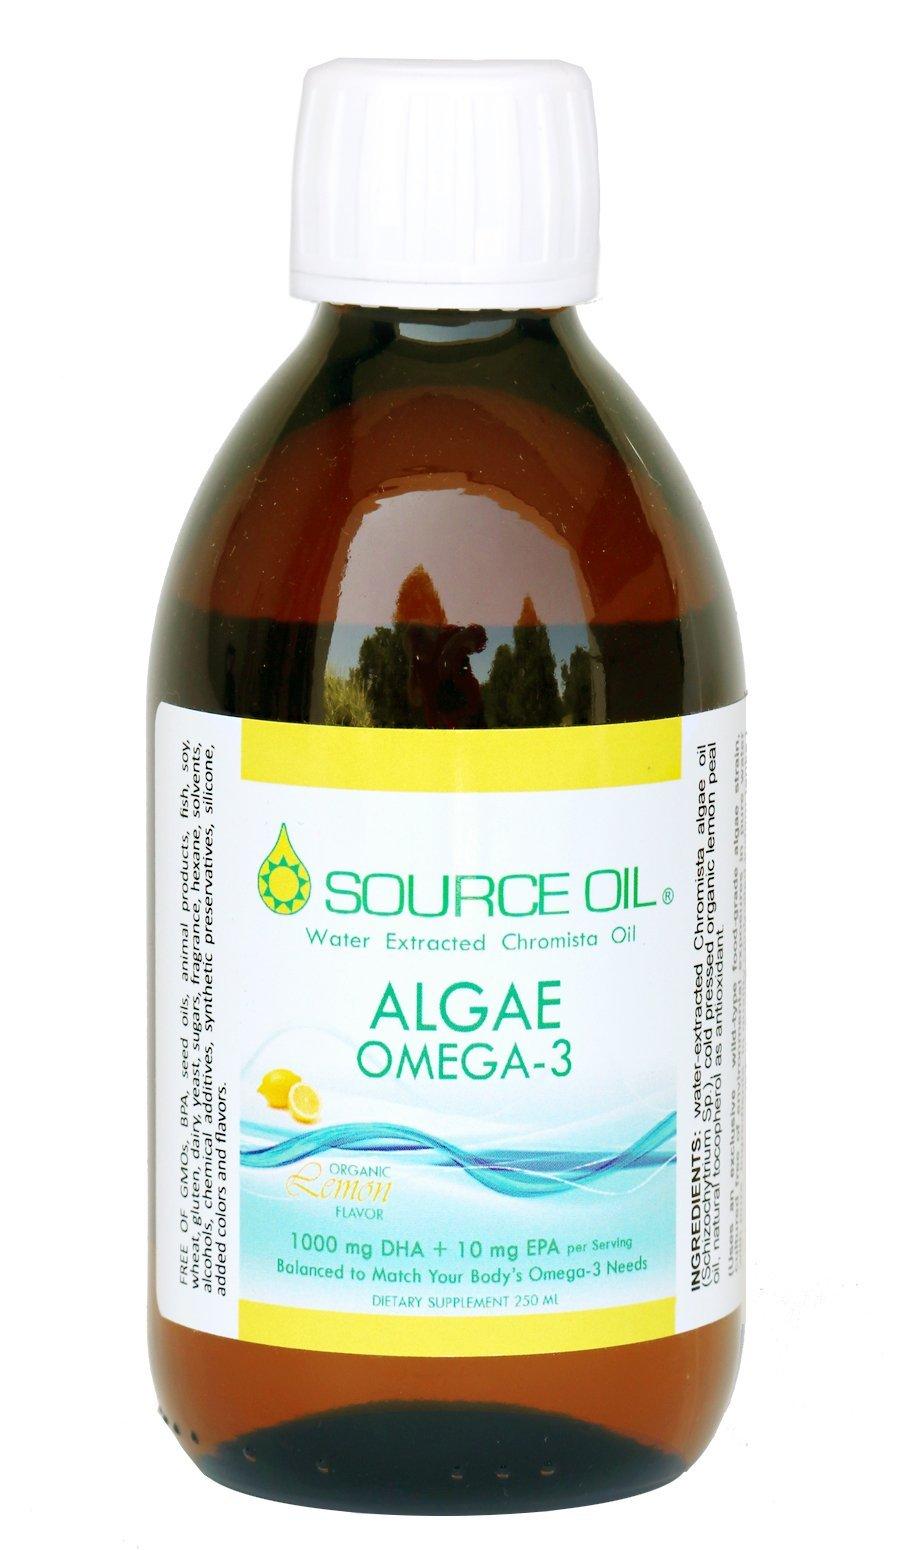 50% DHA Source Oil Algae Omega-3 (Organic Lemon Flavor)